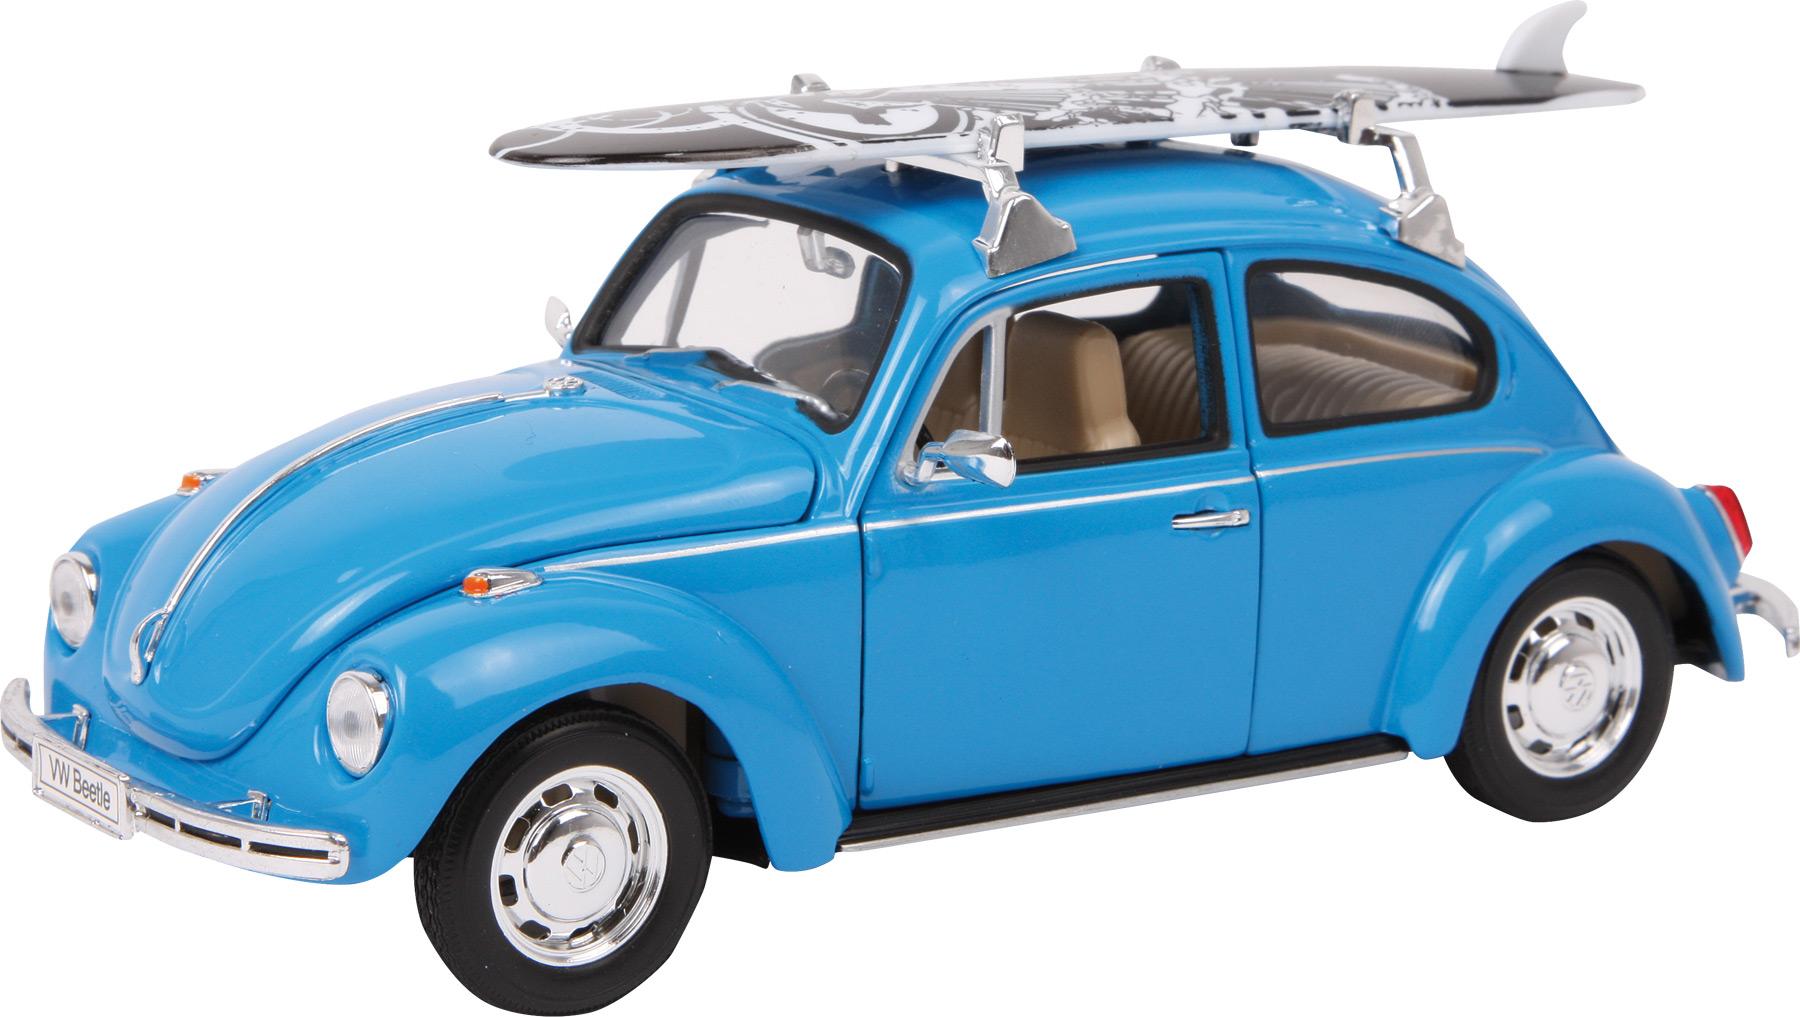 Small Foot Model auta VW  Beetle so surfom